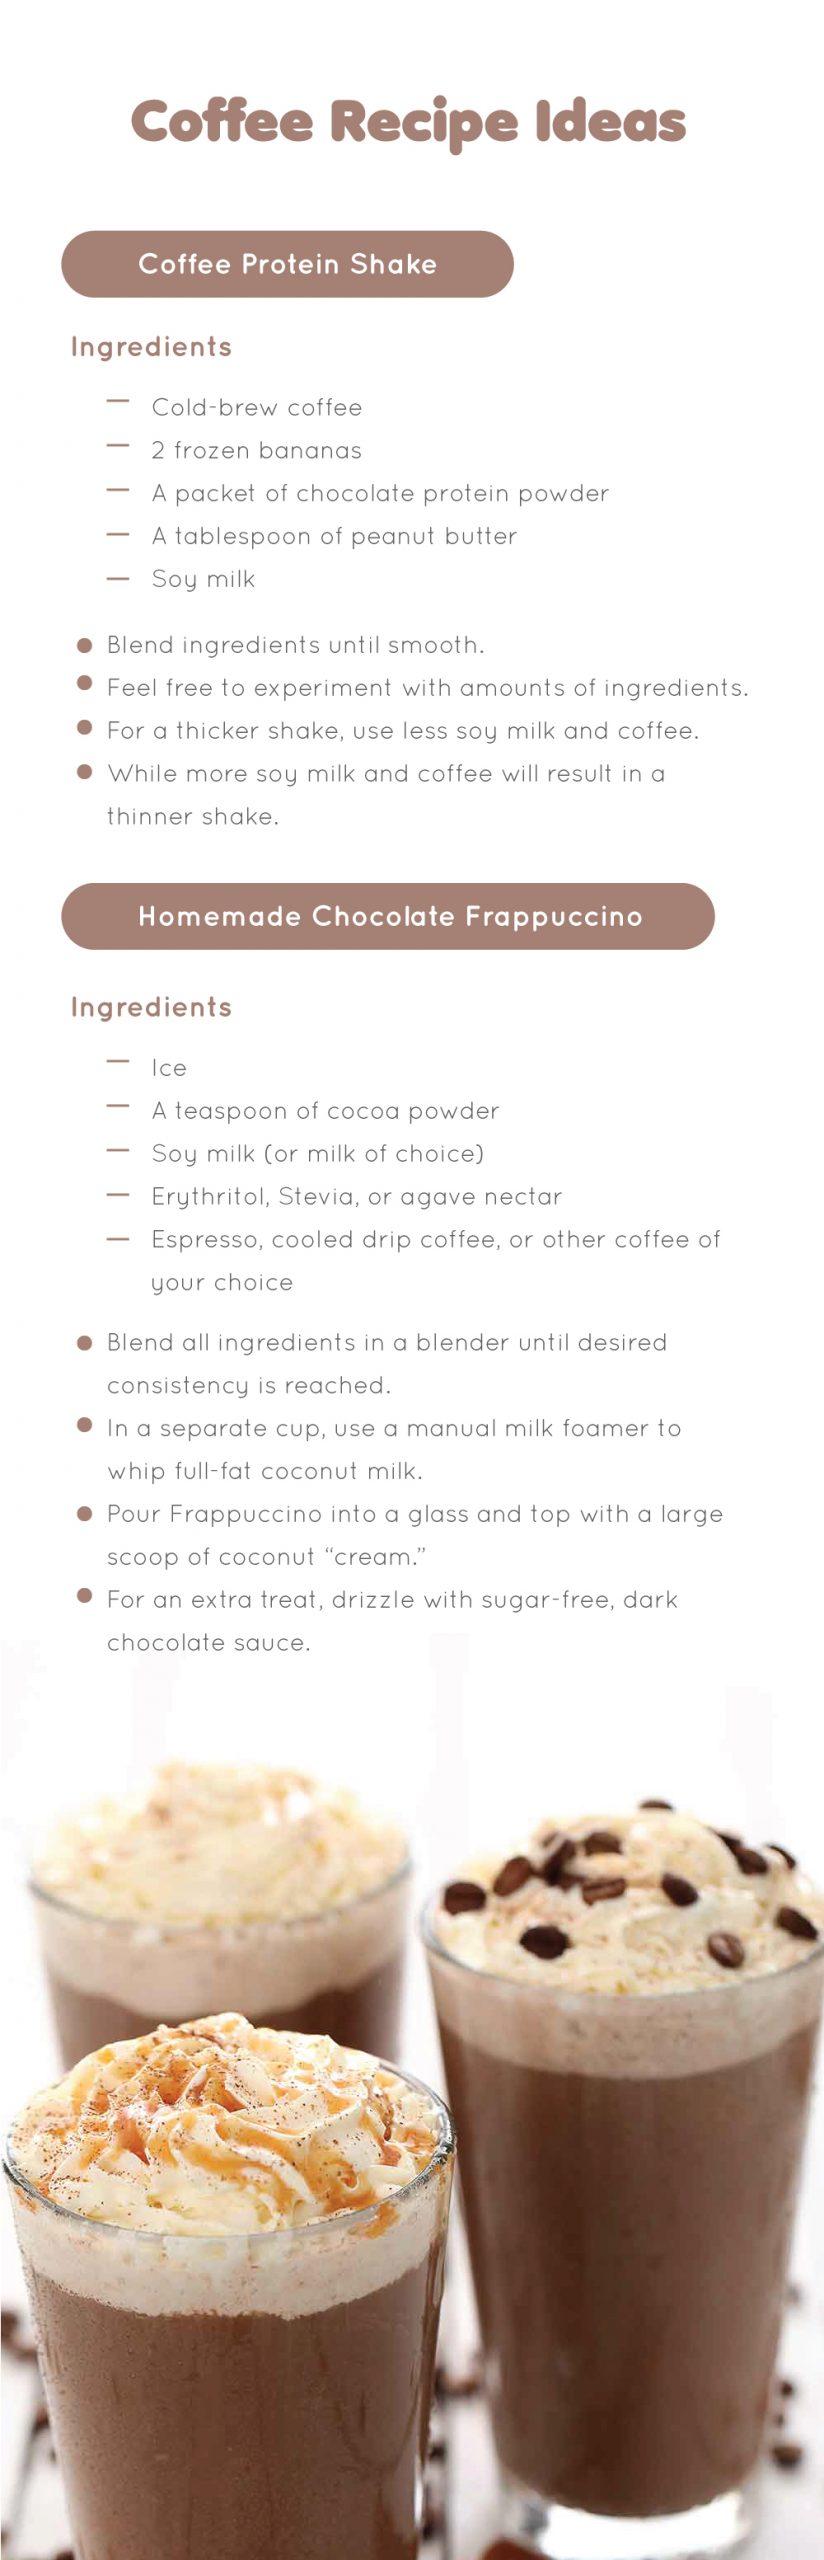 Coffee Recipe Ideas